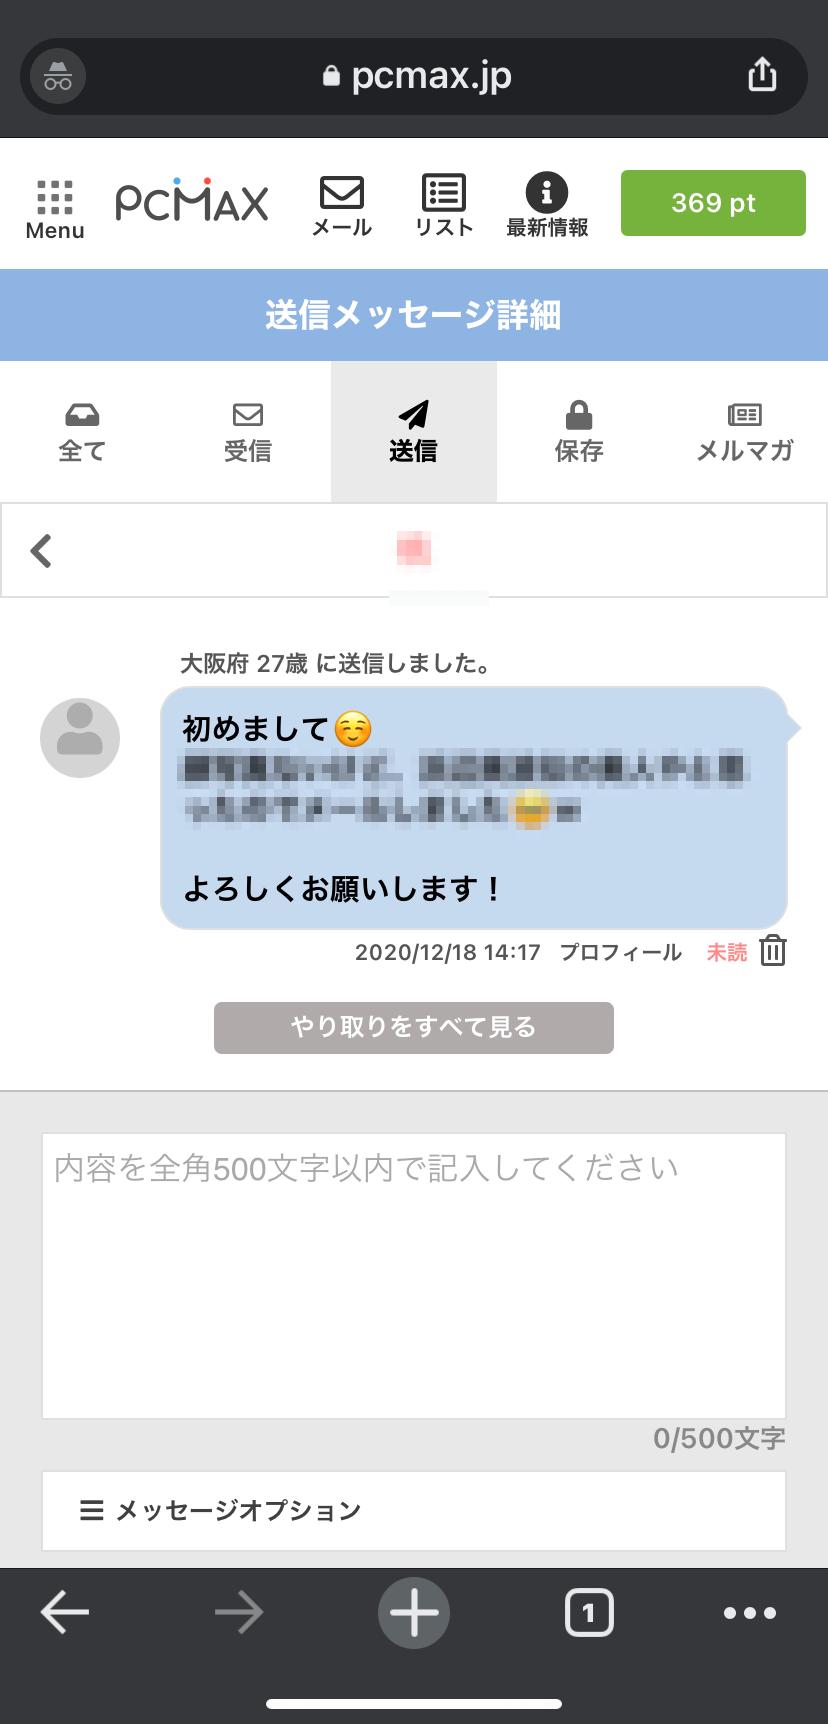 pcmaxの検索2人目:凛ちゃん:メール